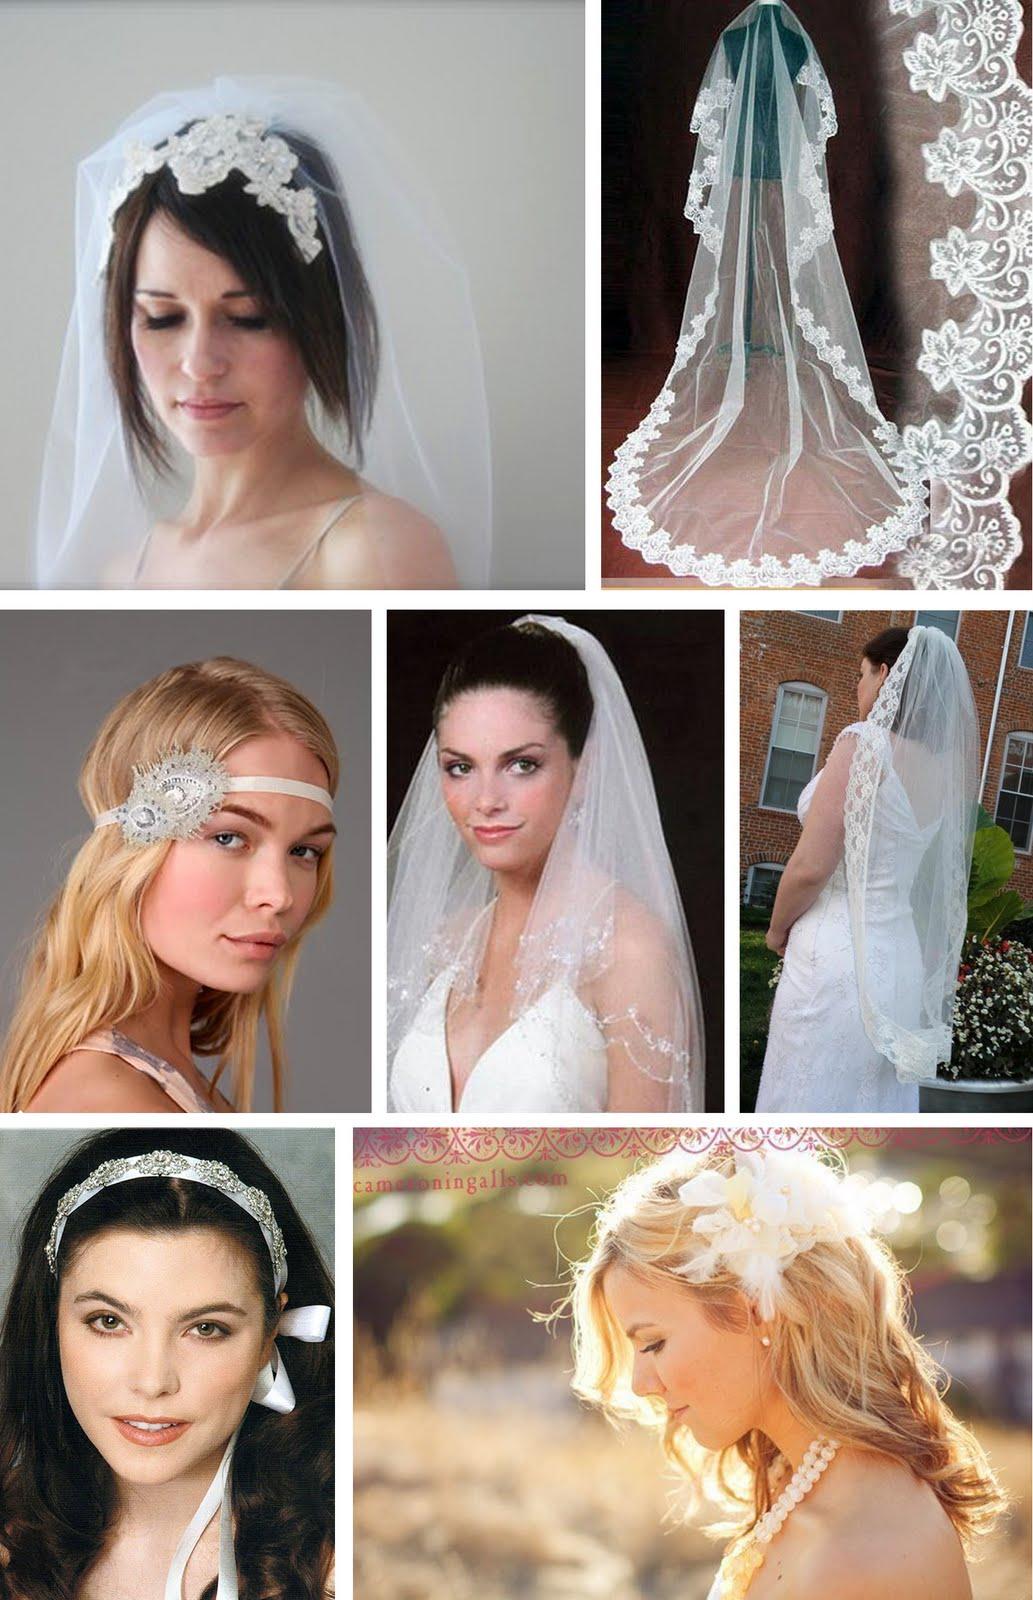 wedding veils hair accessories wedding hair pieces Wedding Veils Hair Accessories